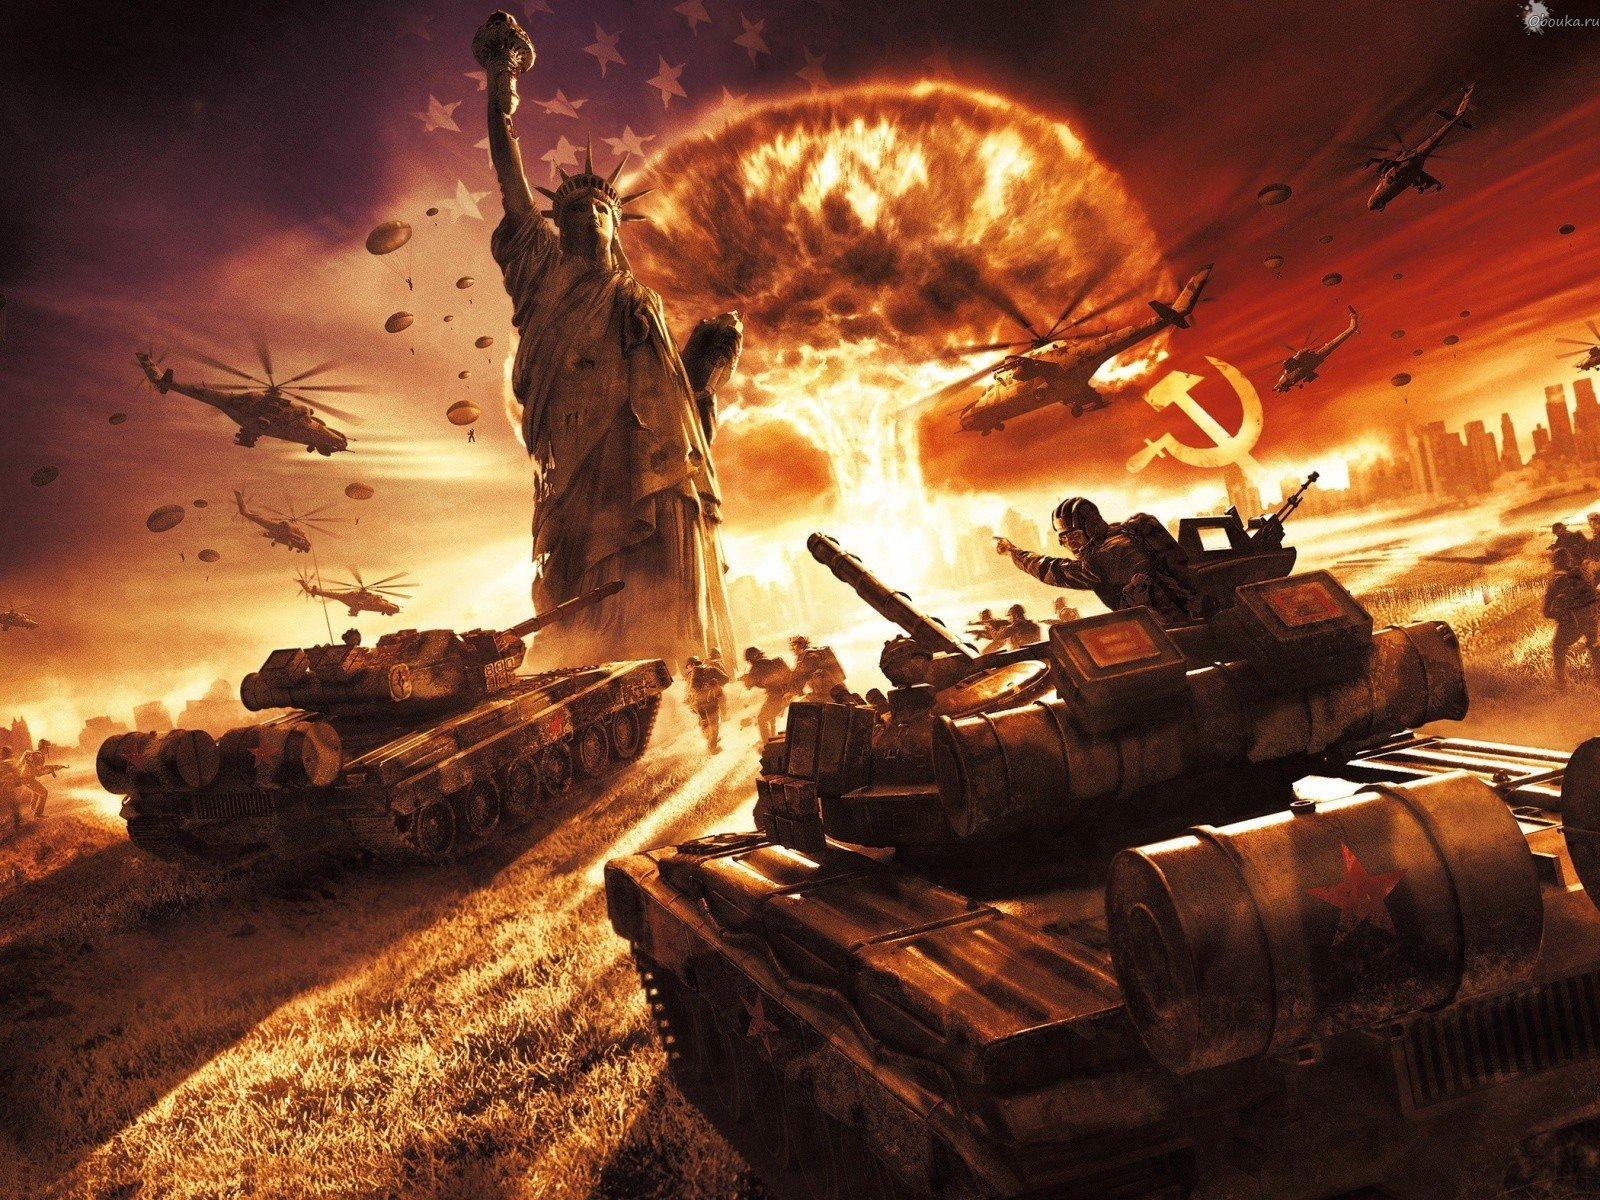 Россия угрожает международному порядку, - постпред США при ООН Пауэр - Цензор.НЕТ 9967